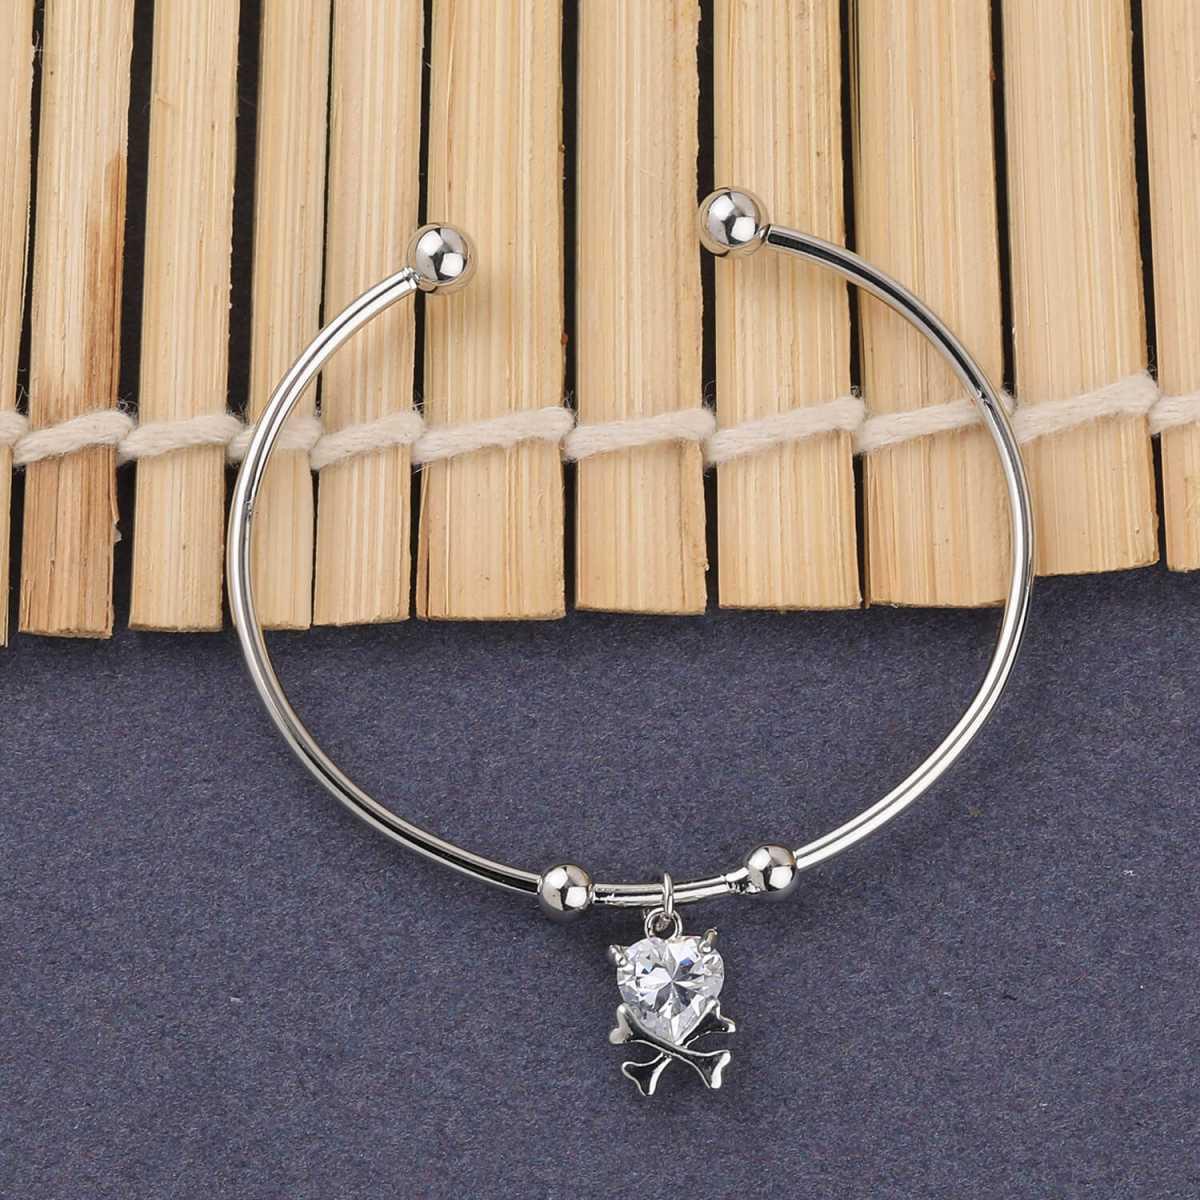 SILVER SHINE Antique Designer Adjustable Bracelet With Diamond For Women Girls